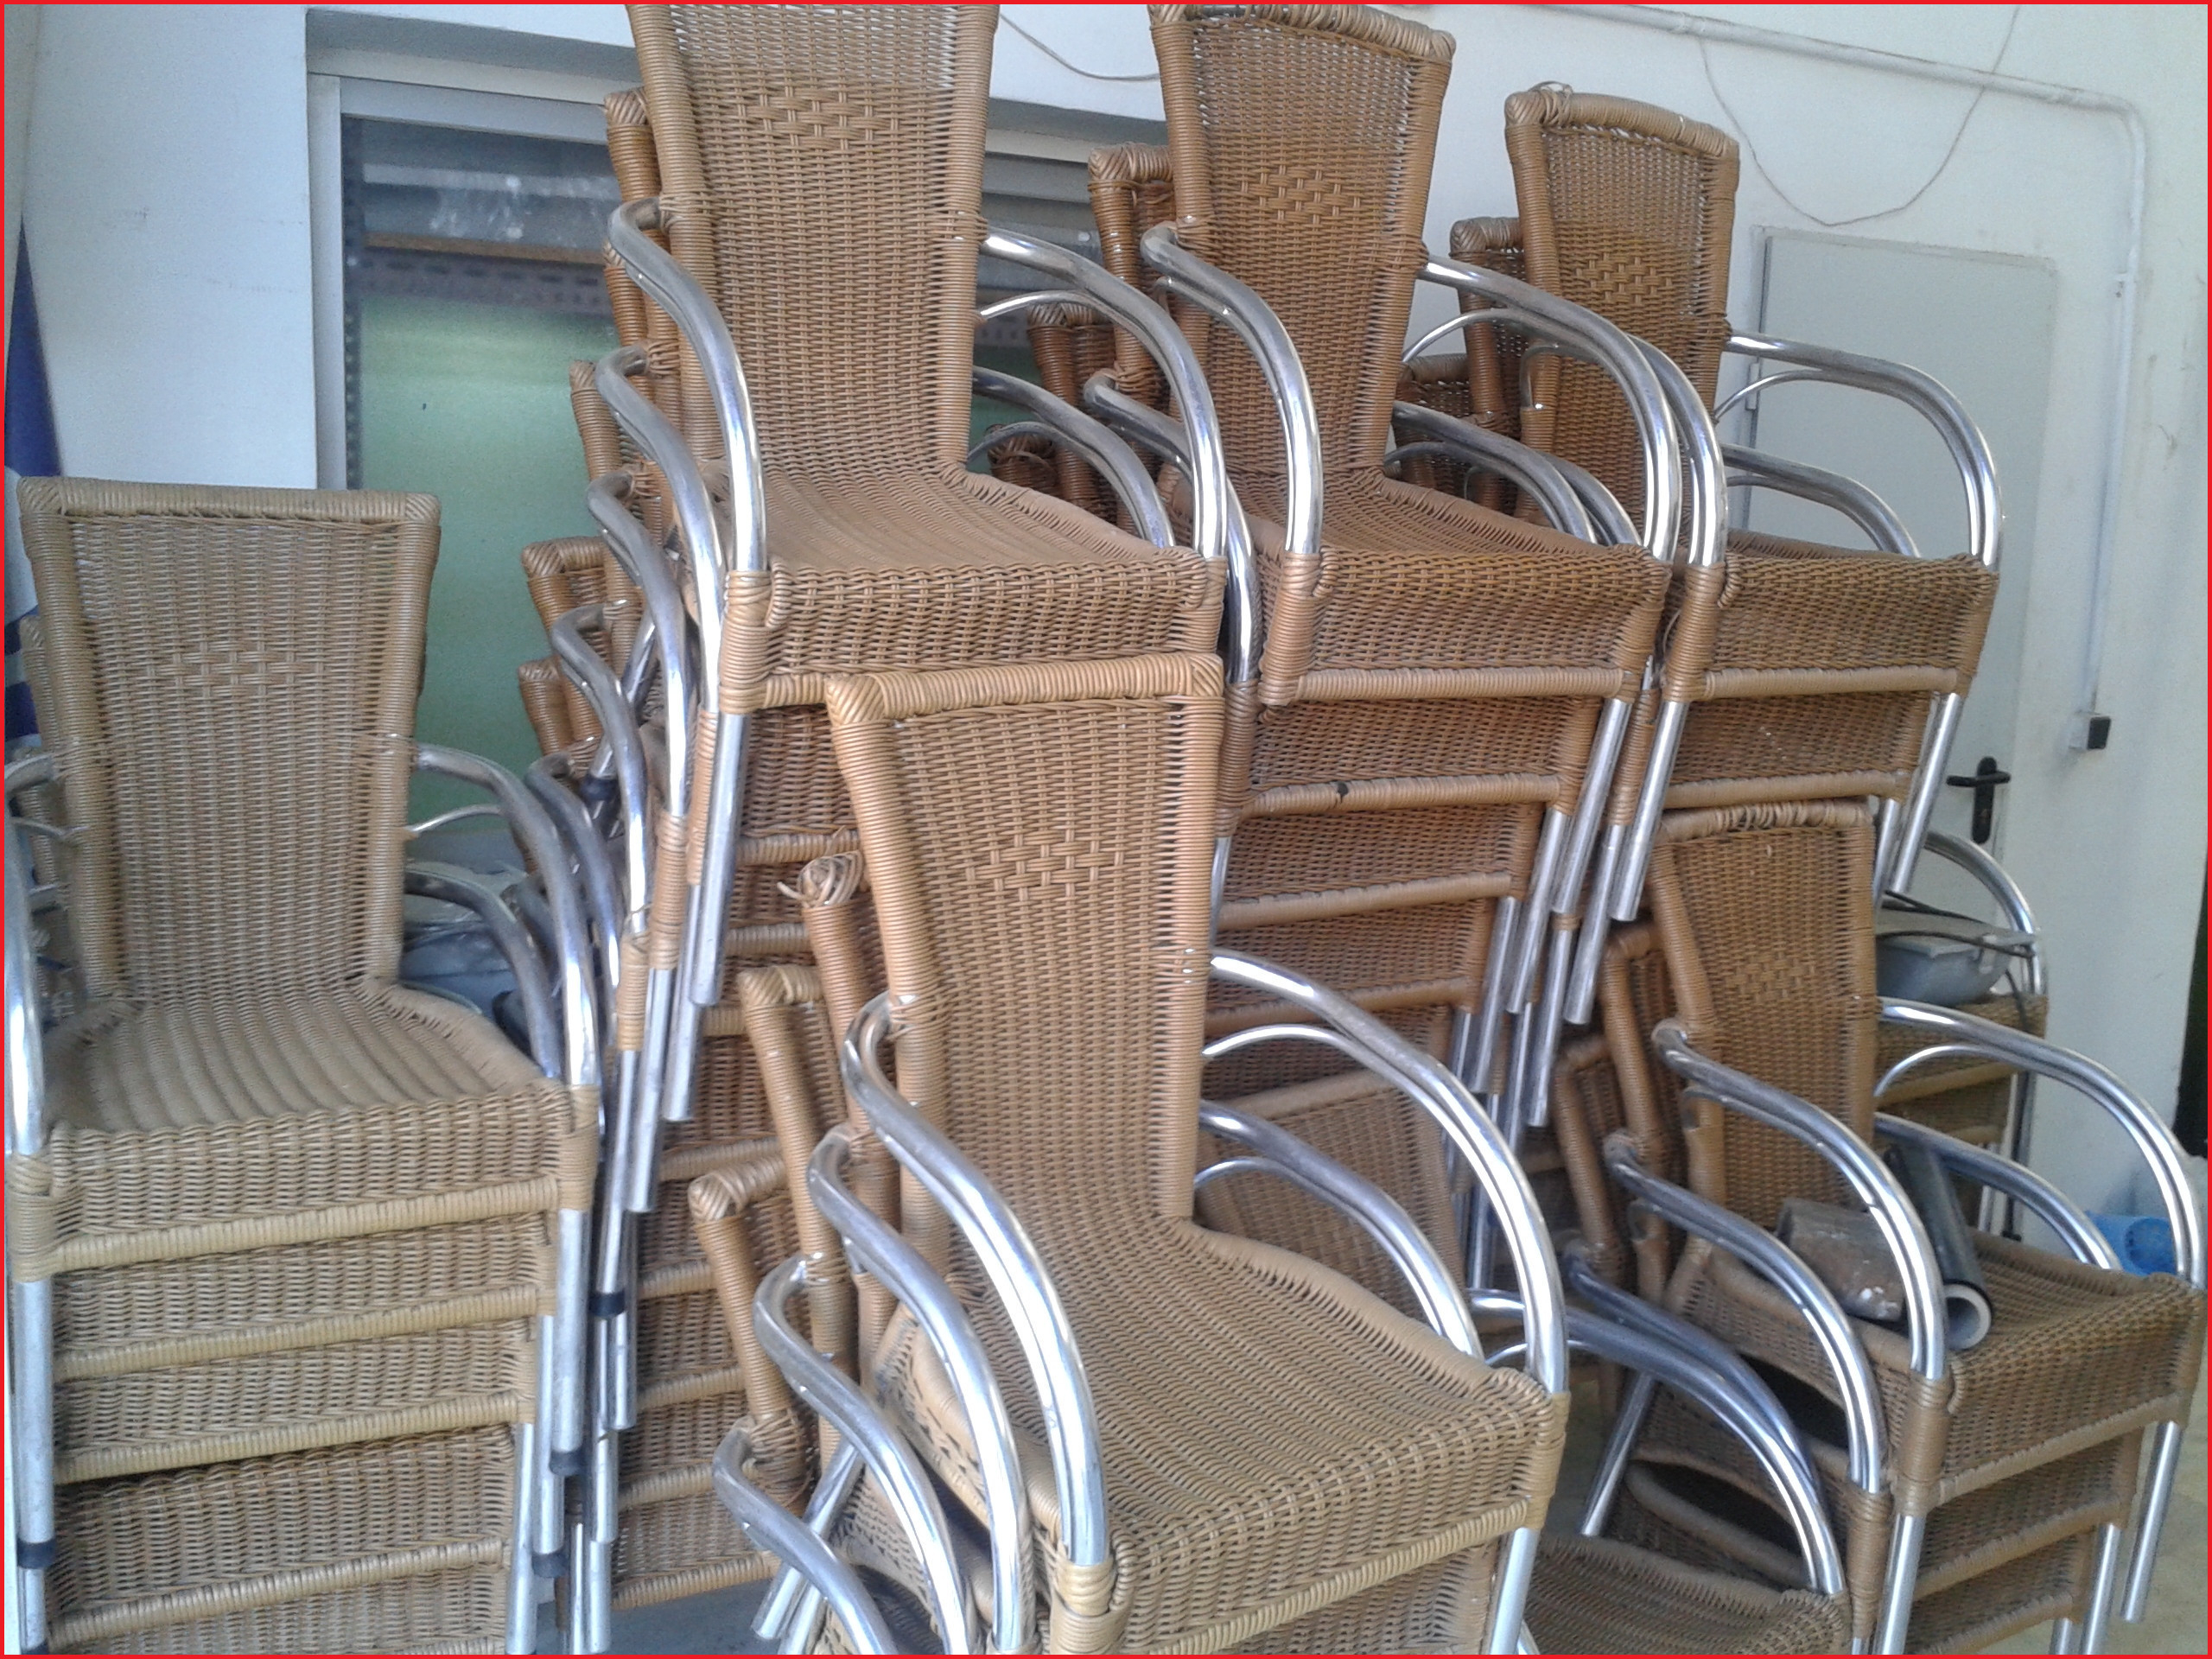 Sillas De Terraza Segunda Mano 87dx Sillas Terraza Bar Segunda Mano Muebles De Terraza Segunda